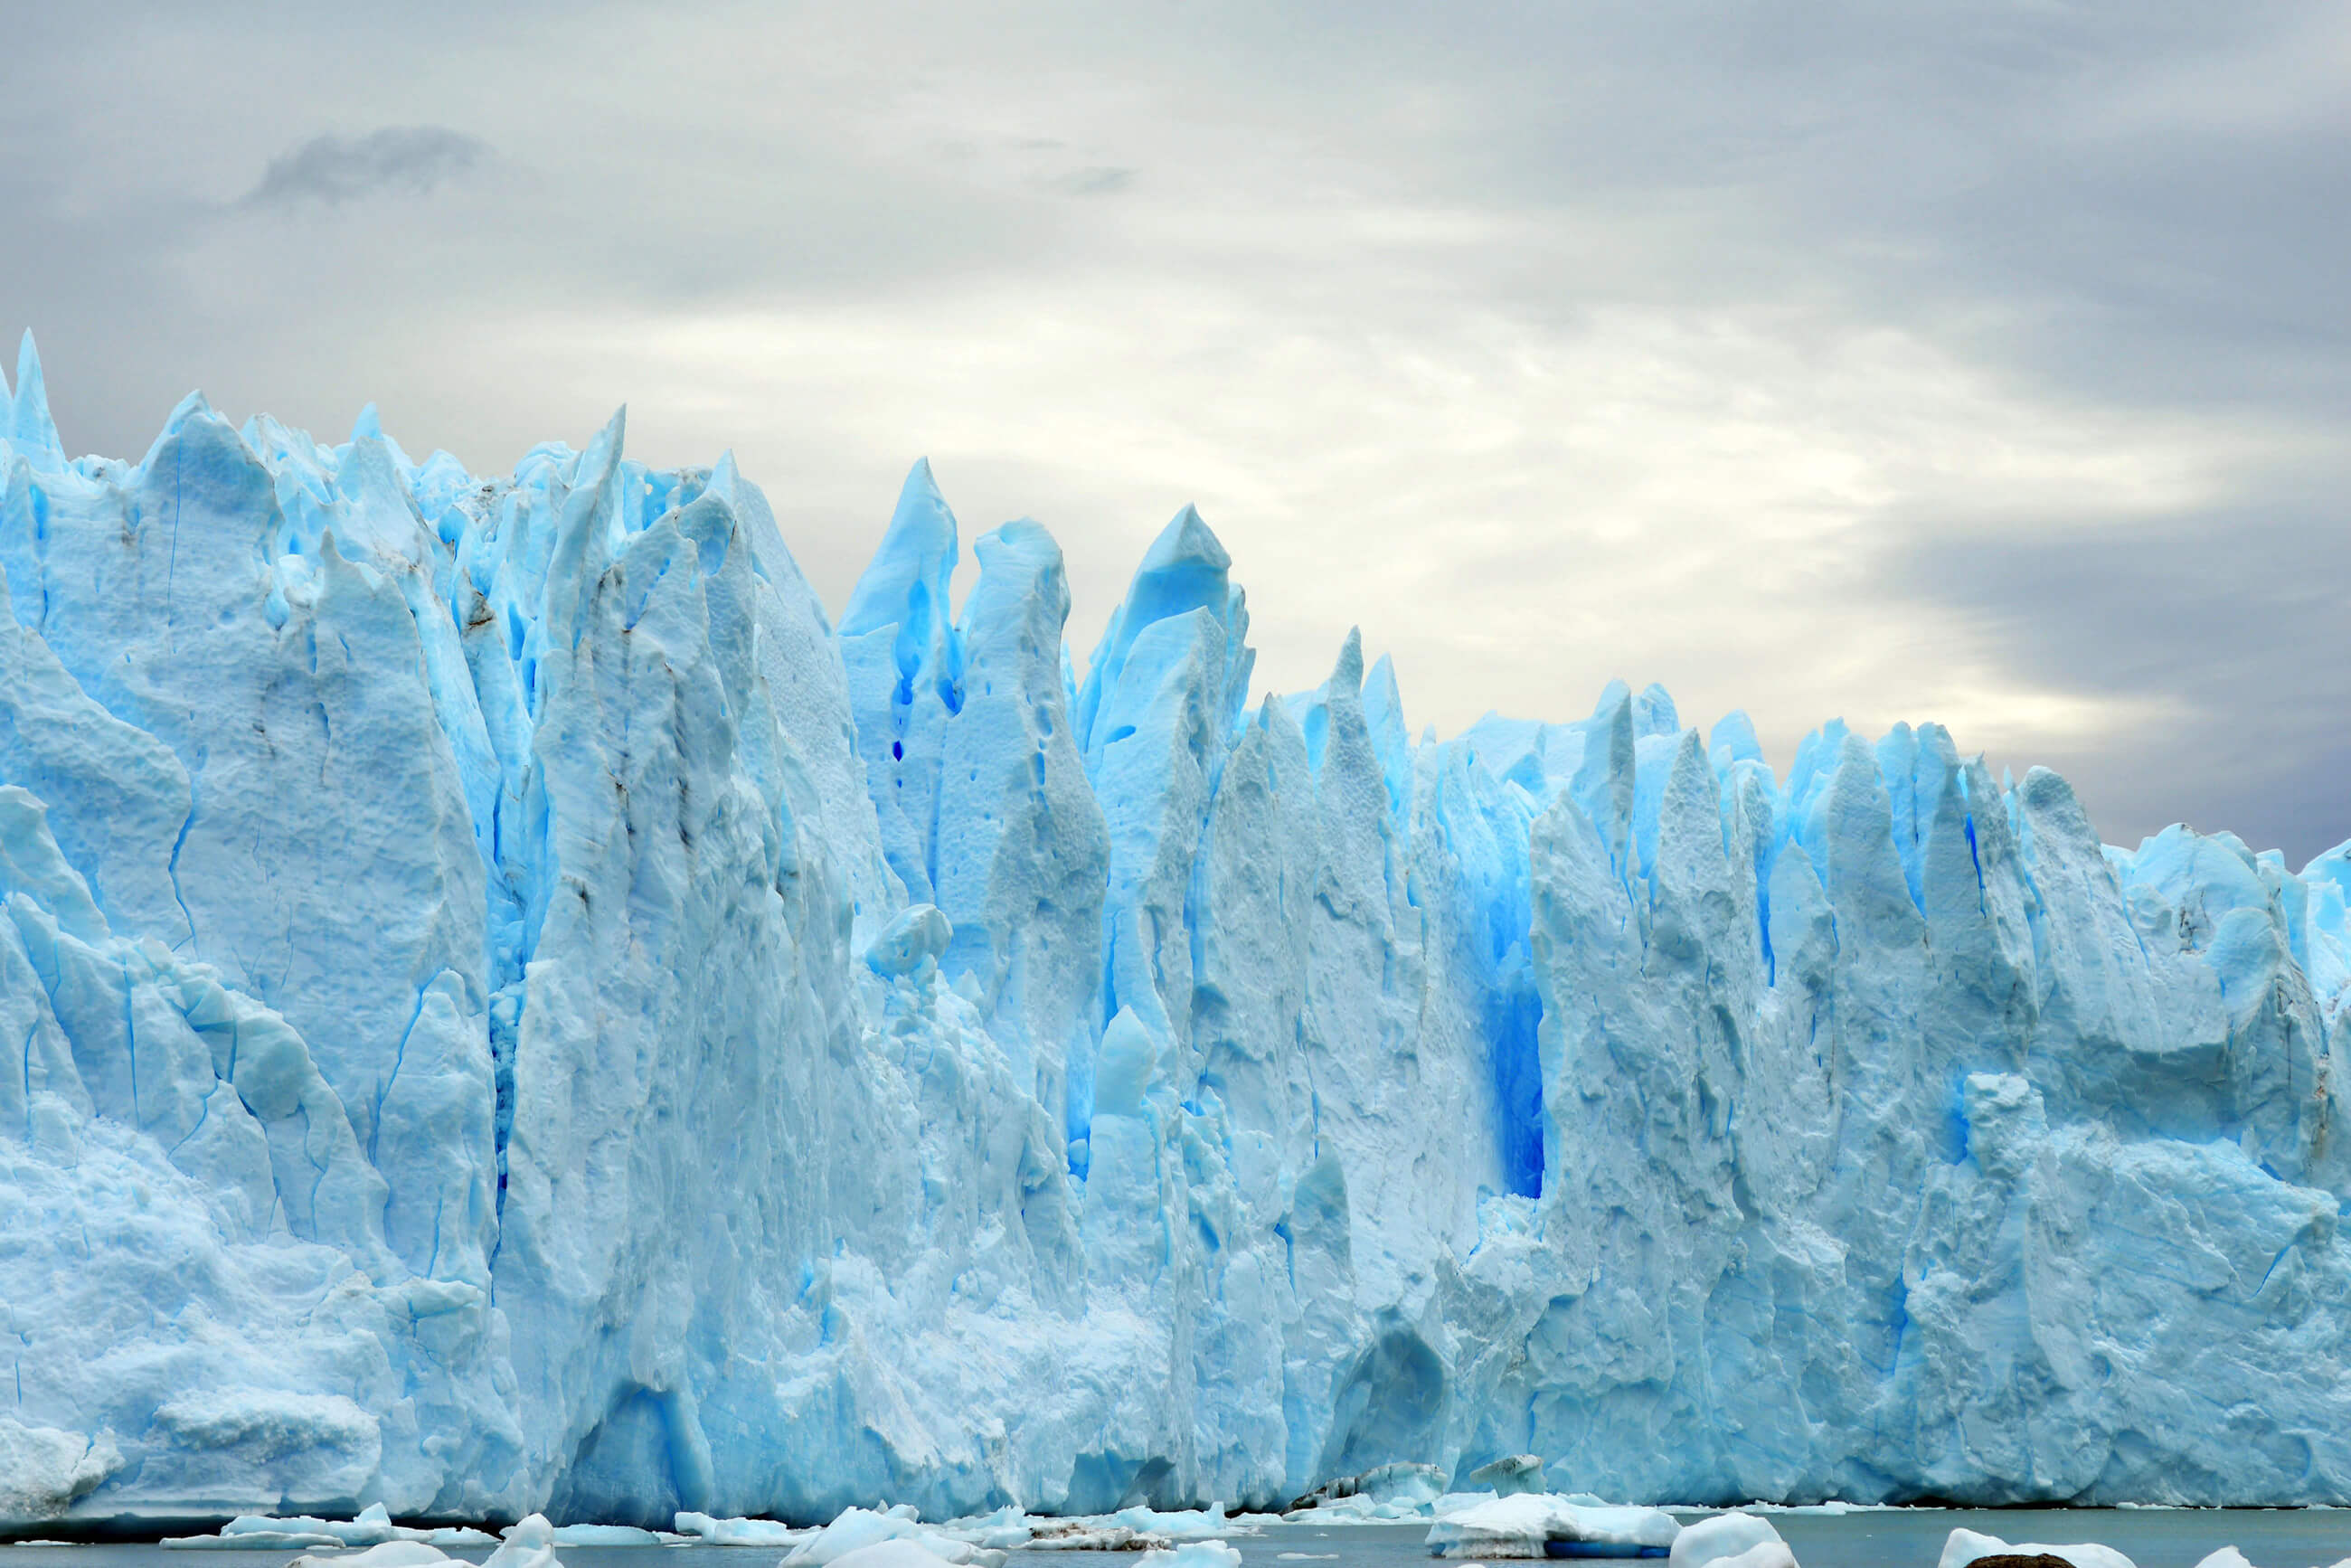 https://bubo.sk/uploads/galleries/5017/patagonia-389306.jpg